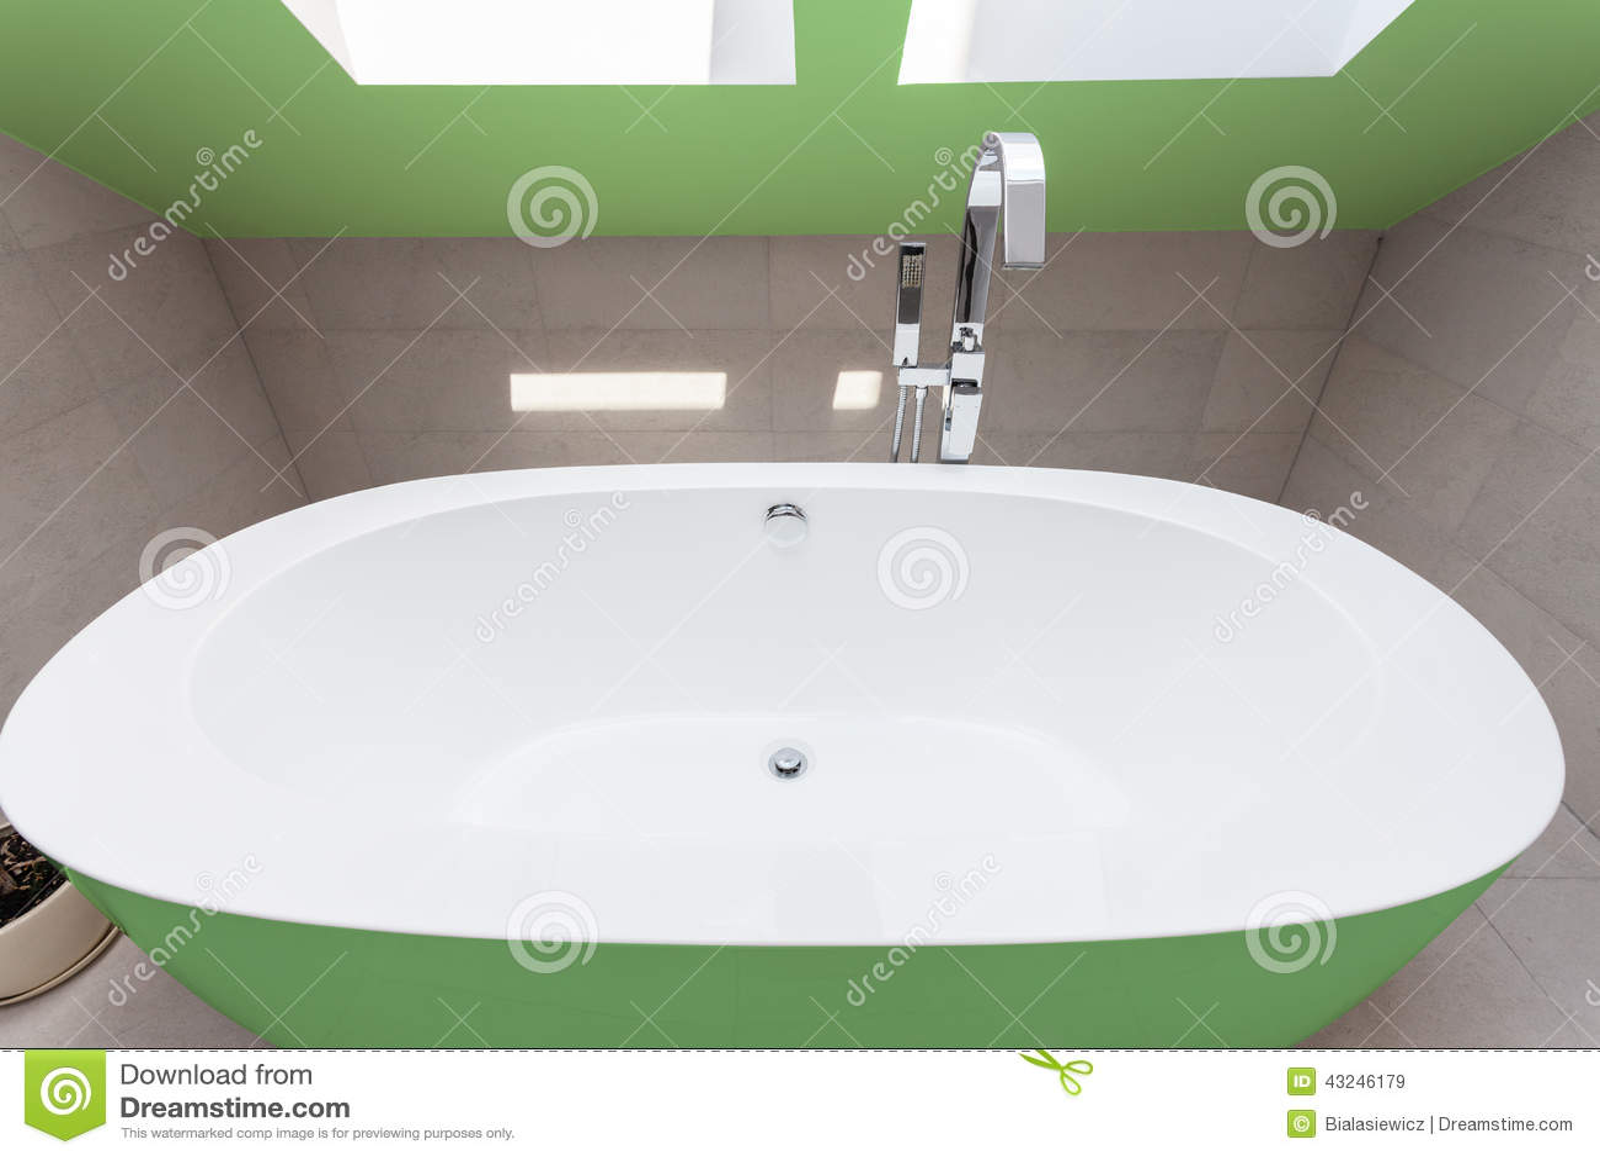 Grönt badkar i badrum arkivfoto   bild: 43246179